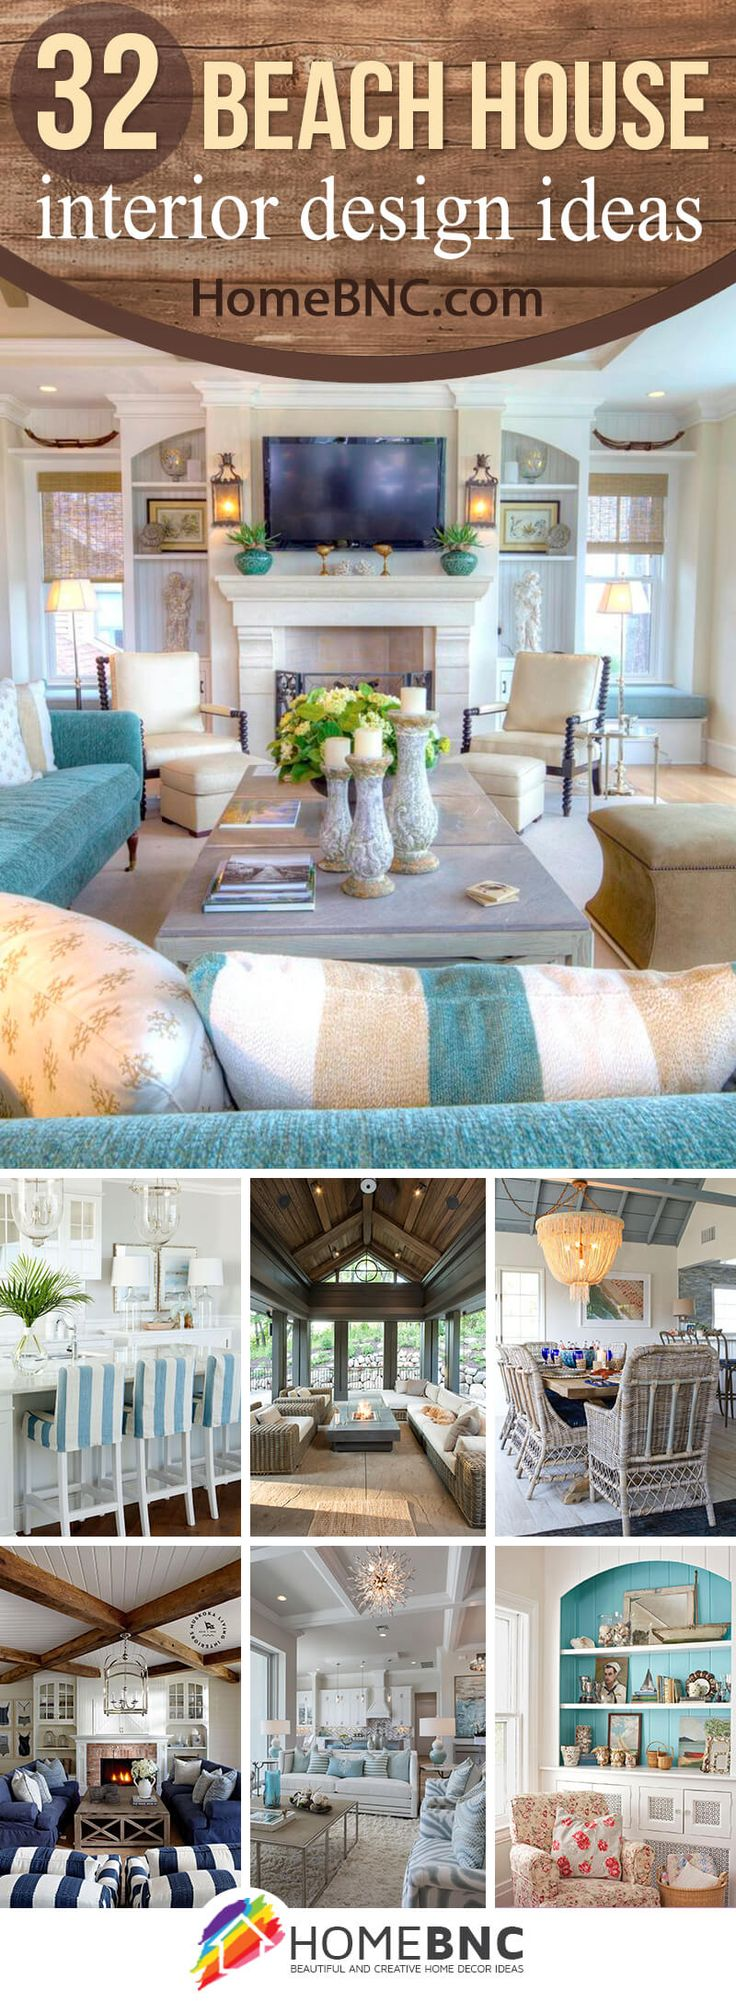 Beach home decorating interior - 32 Cozy Beach House Interior Design Ideas You Ll Love This Summer